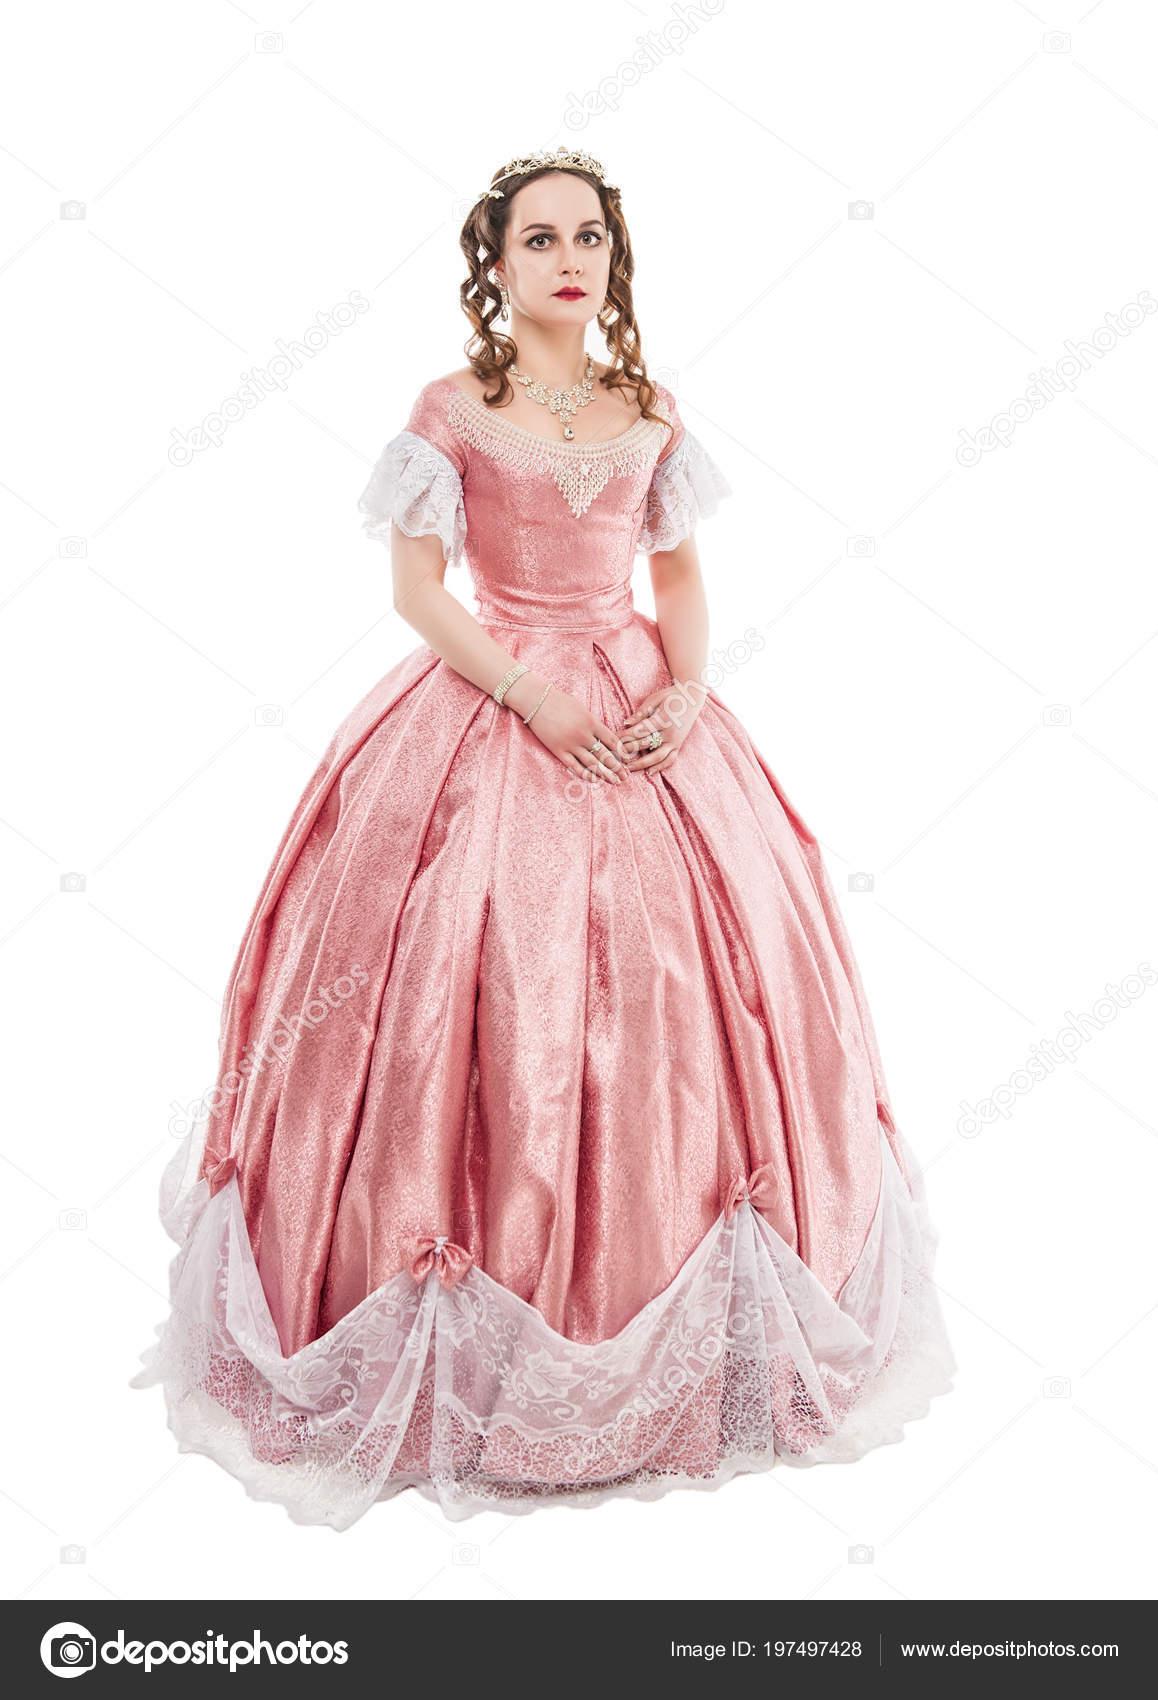 ea02f6c2336c Νεαρή Όμορφη Γυναίκα Στο Μεσαιωνικό Φόρεμα Που Απομονώνονται Λευκό —  Φωτογραφία Αρχείου